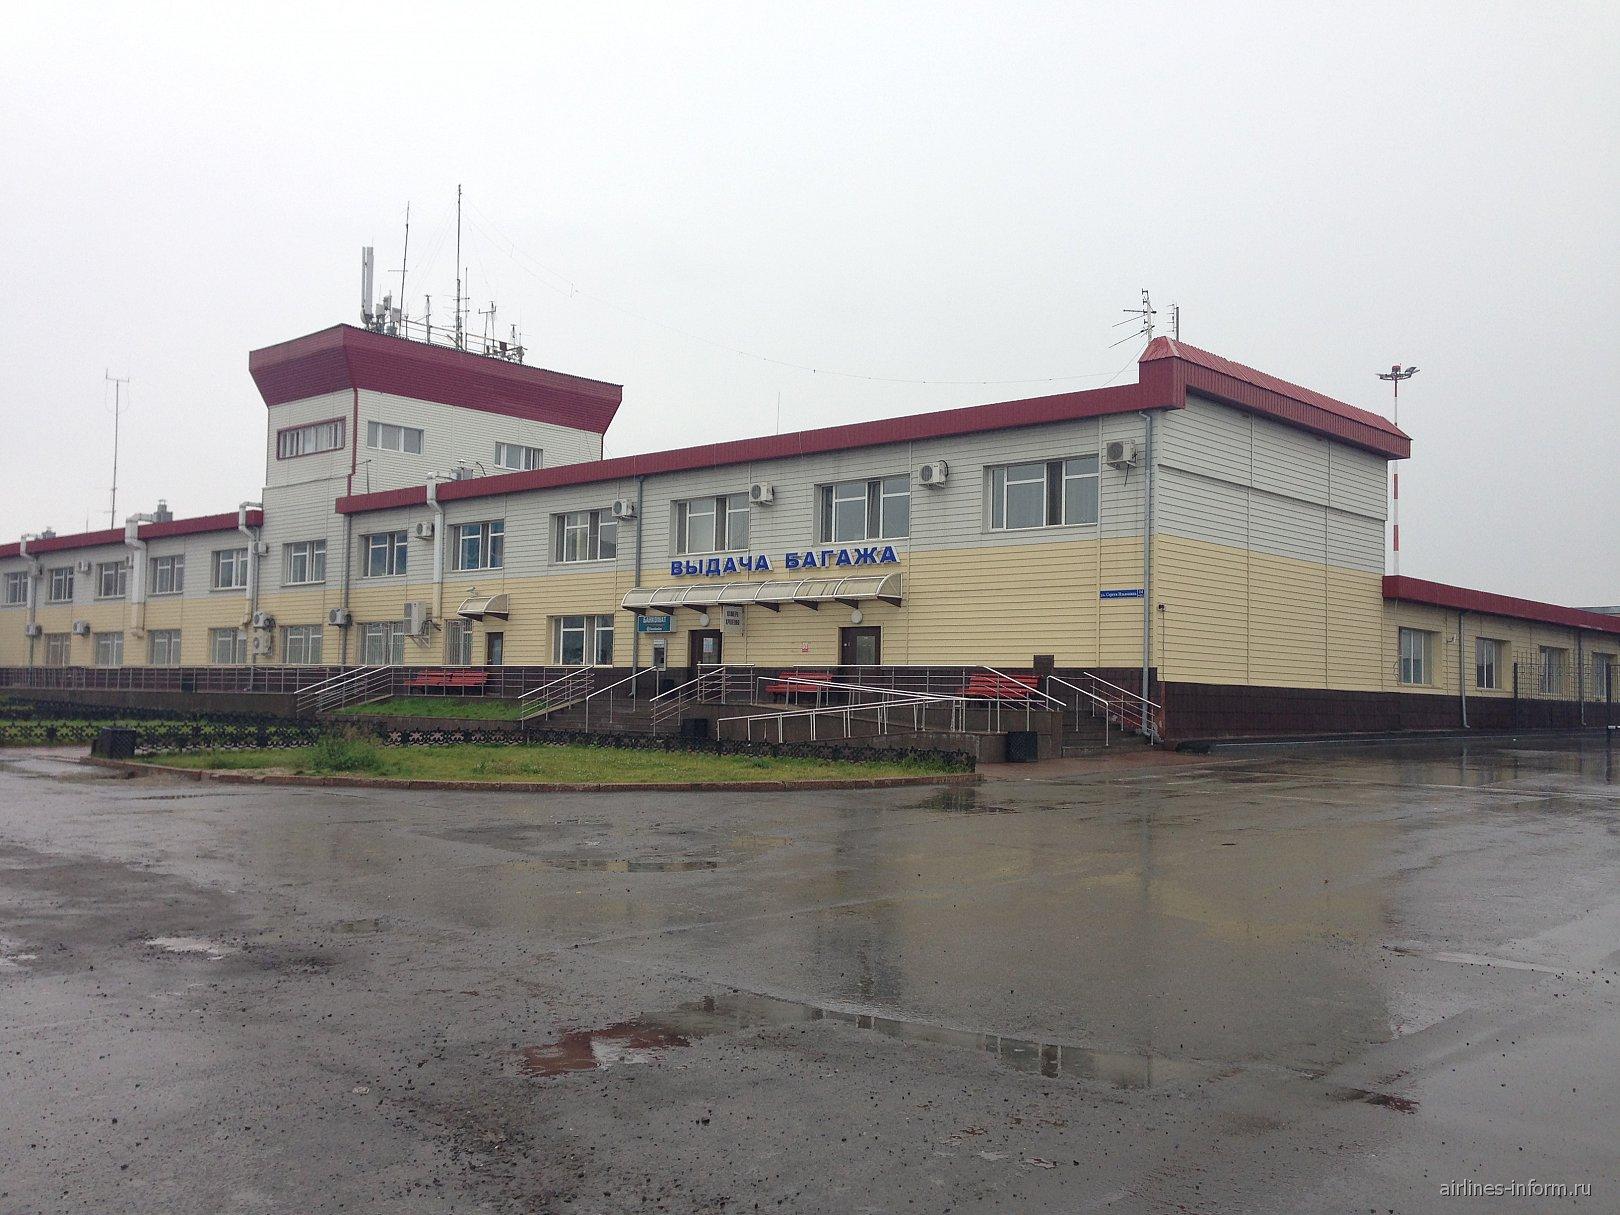 Терминал выдачи багажа в аэропорту Тюмень Рощино